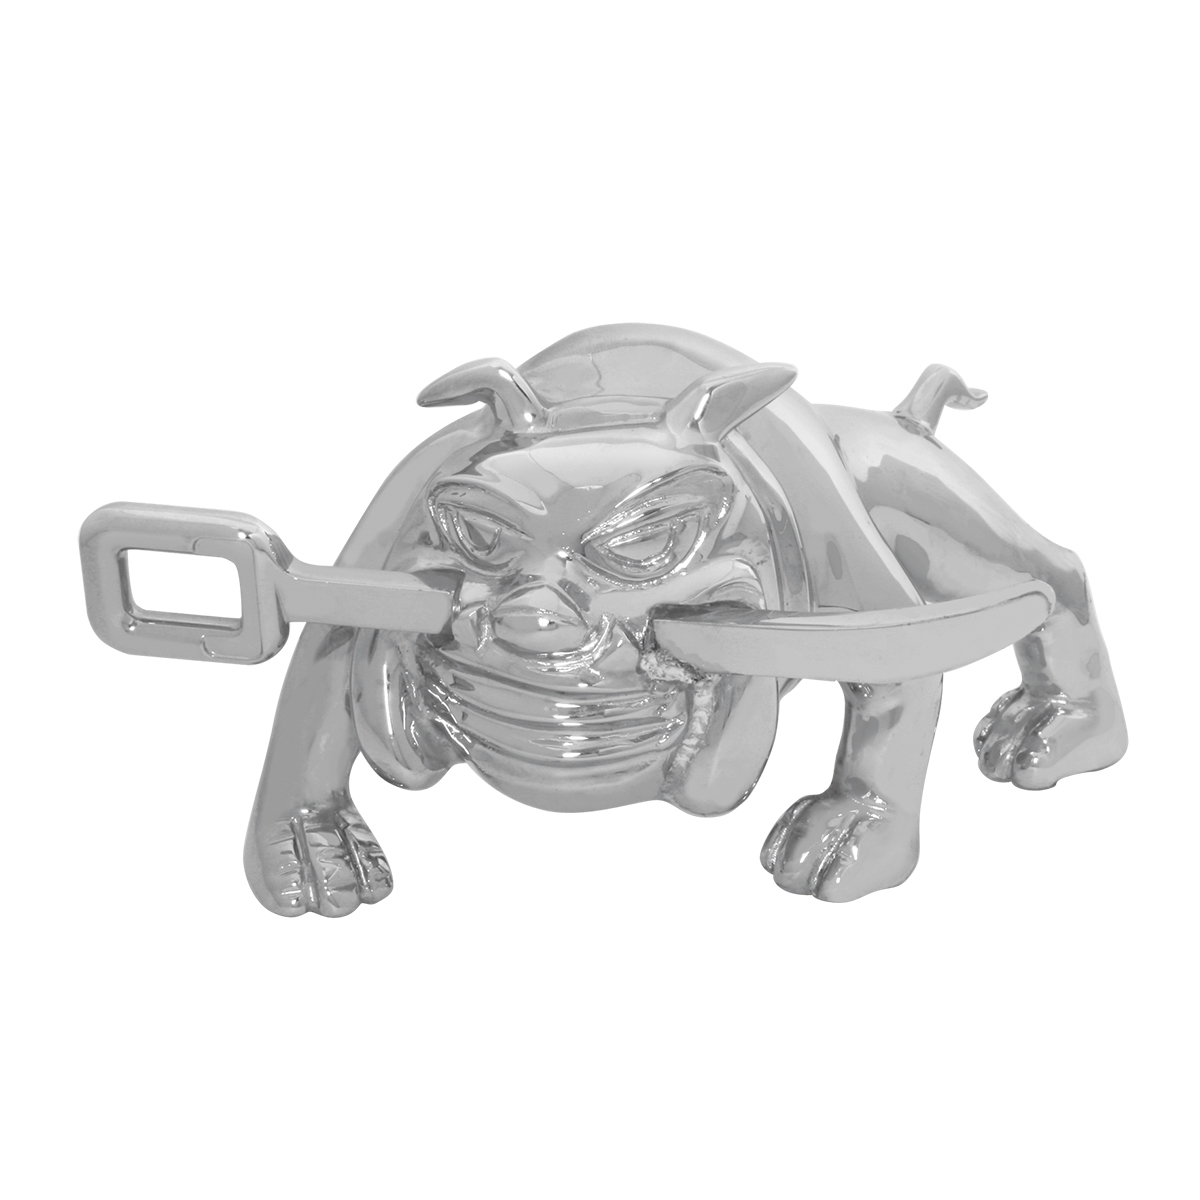 48351 Bulldog with Winch Bar Hood Ornament